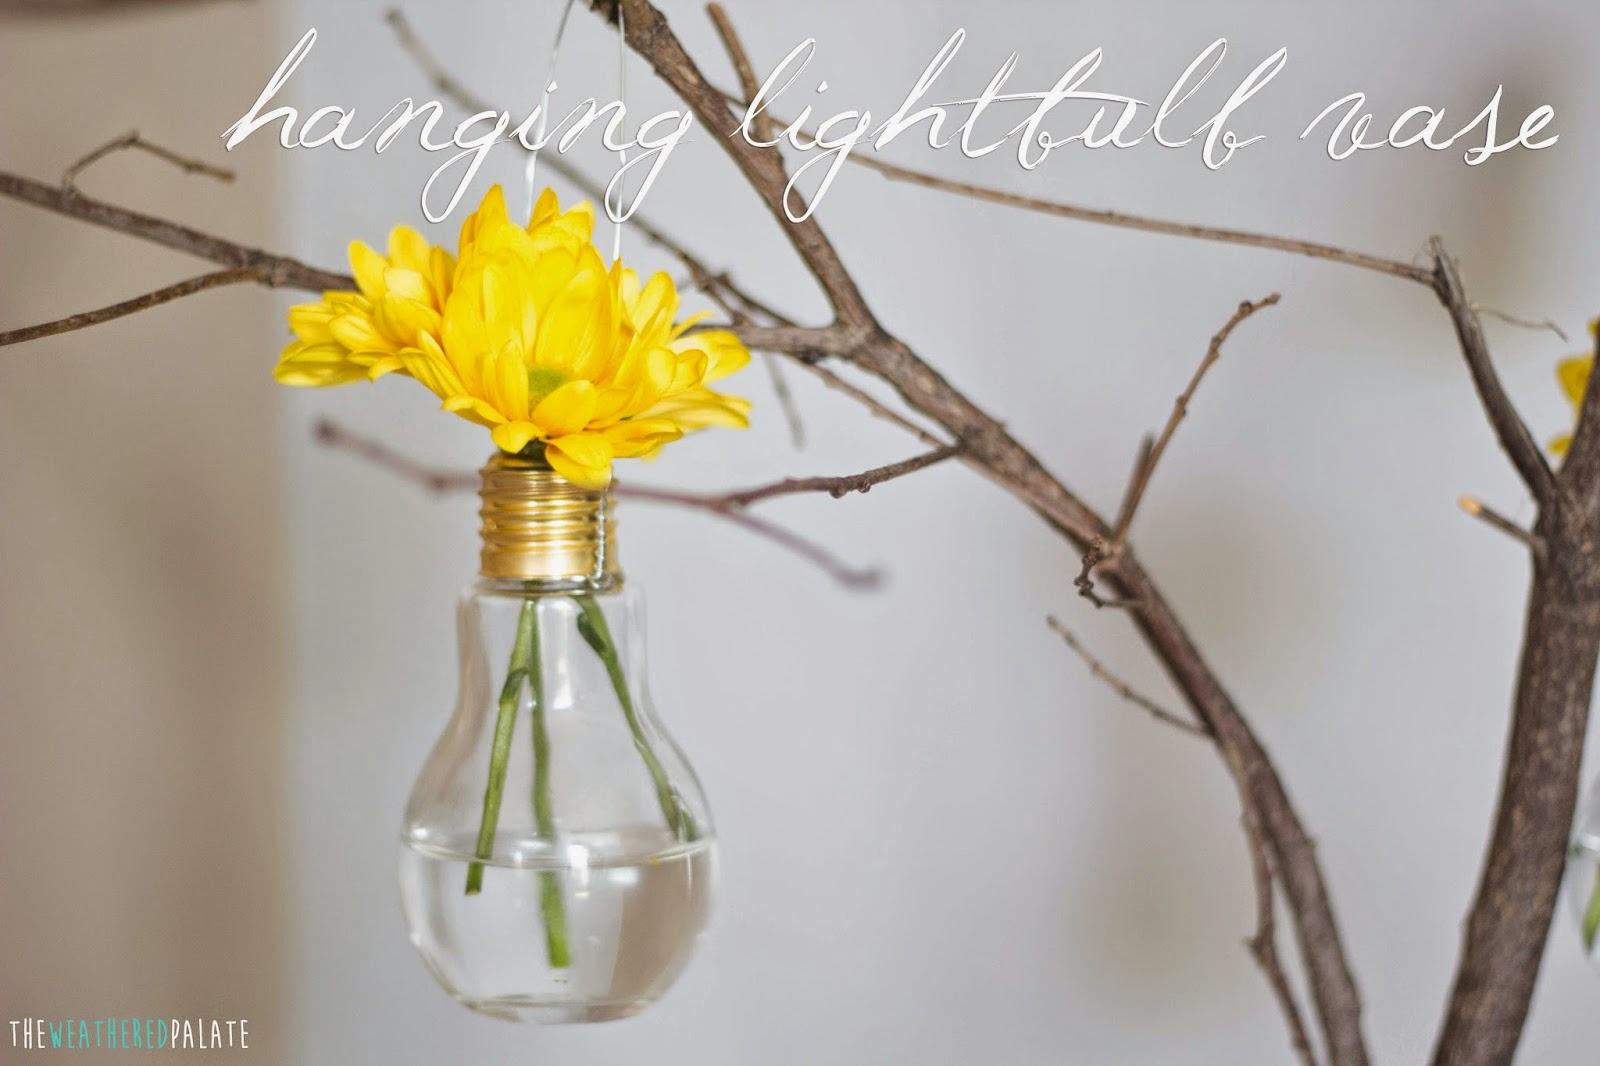 http://www.theweatheredpalate.com/2014/09/hanging-lightbulb-vase.html